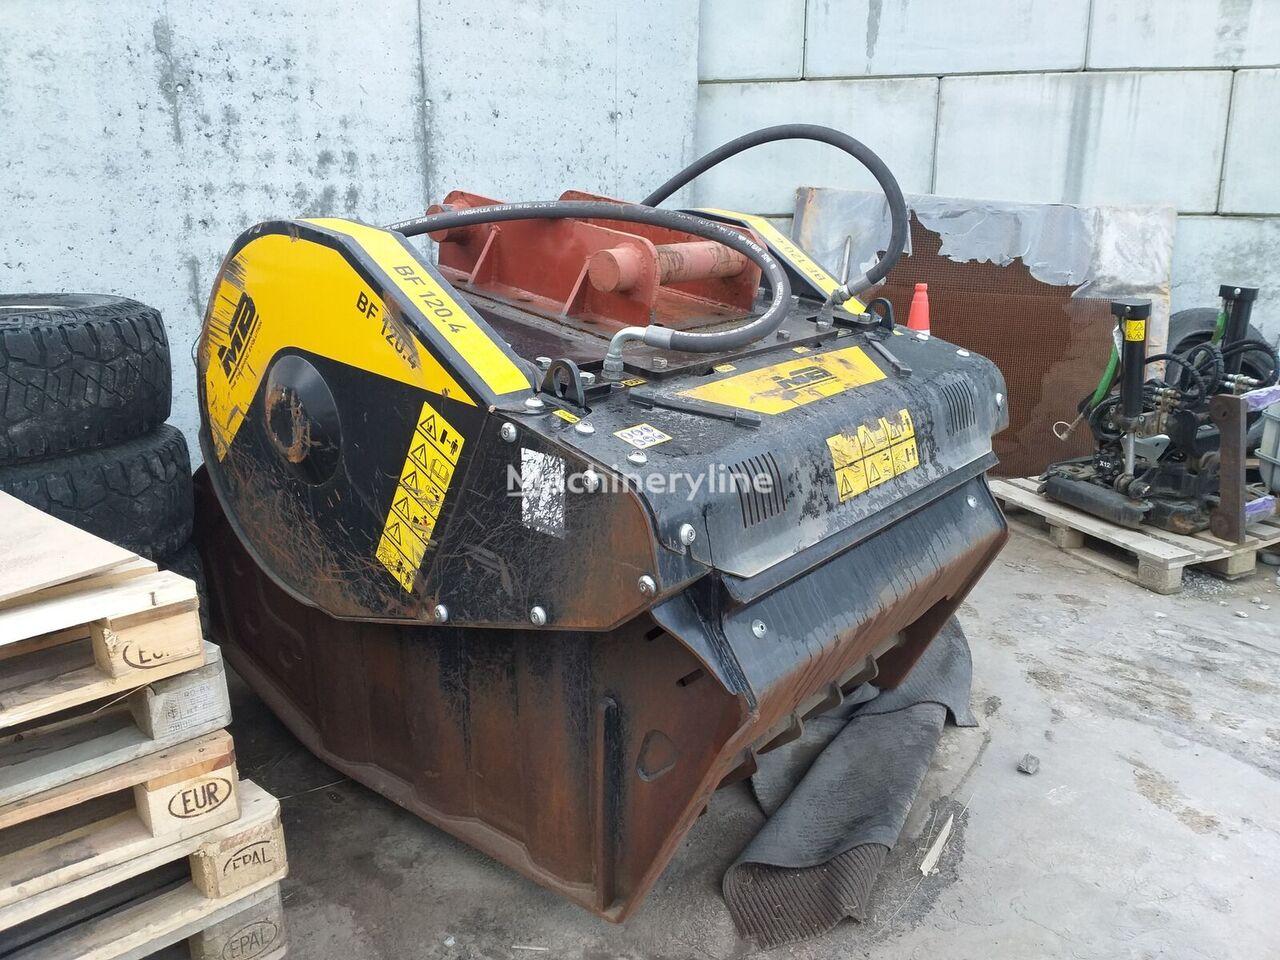 MB Crusher  BF 120.4 crushing bucket